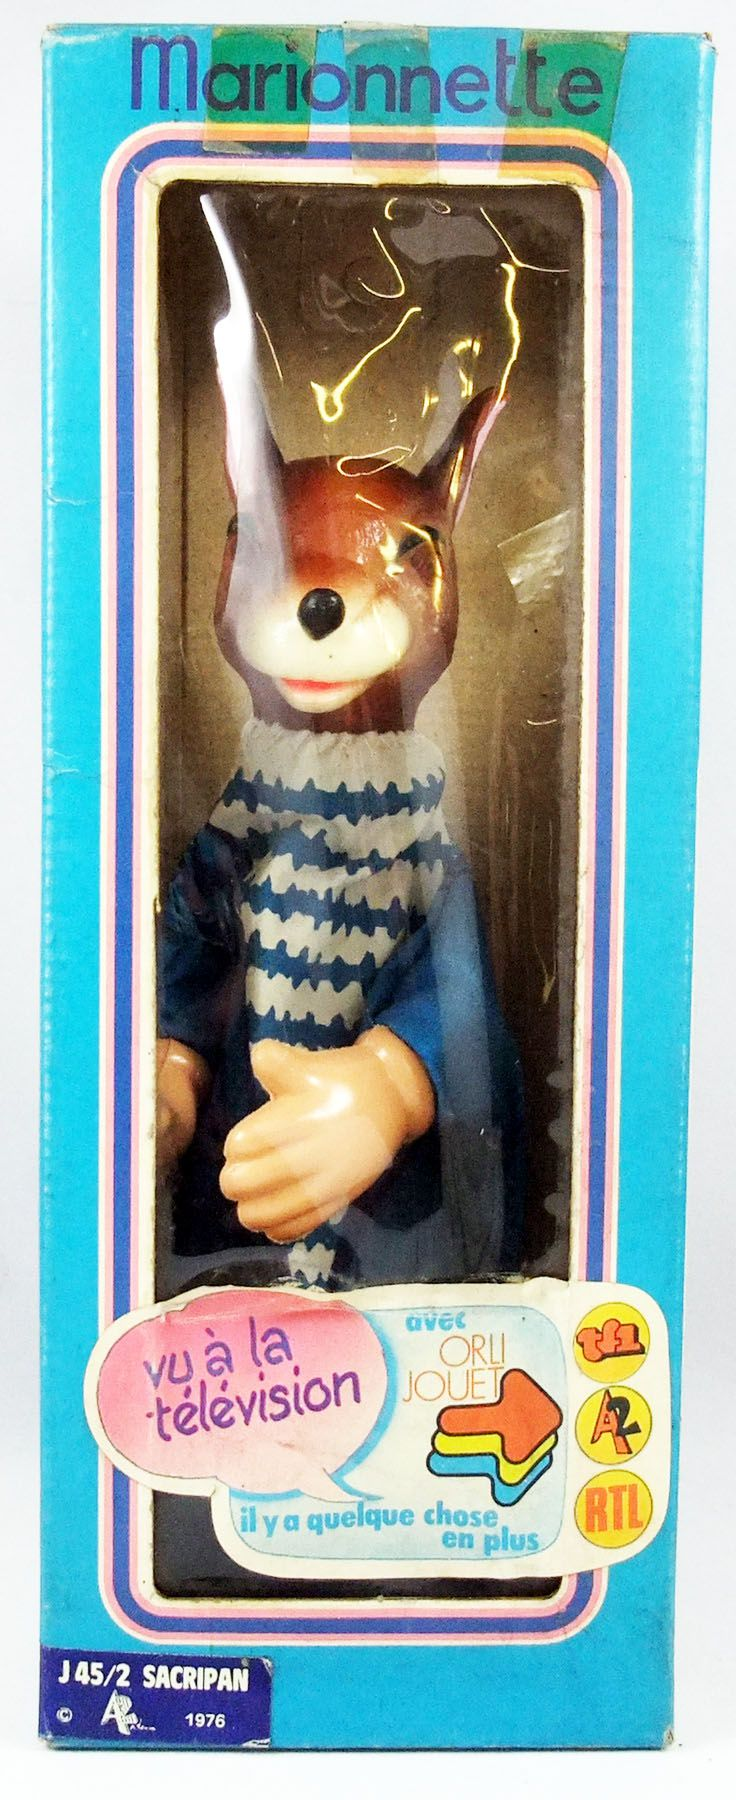 Père Lipopette et Sacripan - Sacripan hand puppet - Orli Jouet Antenne2 1976